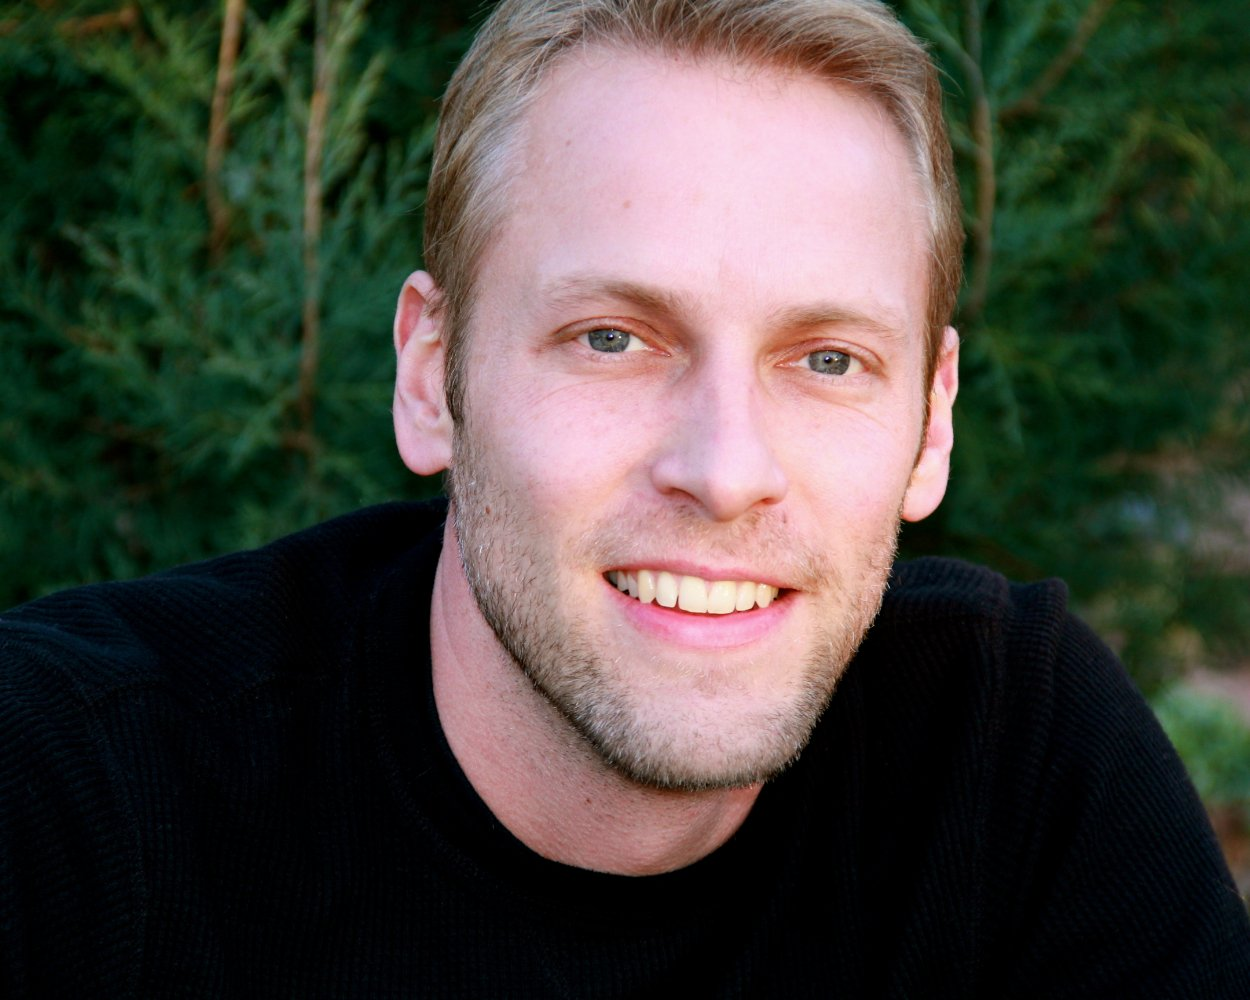 Keith Nussbaum